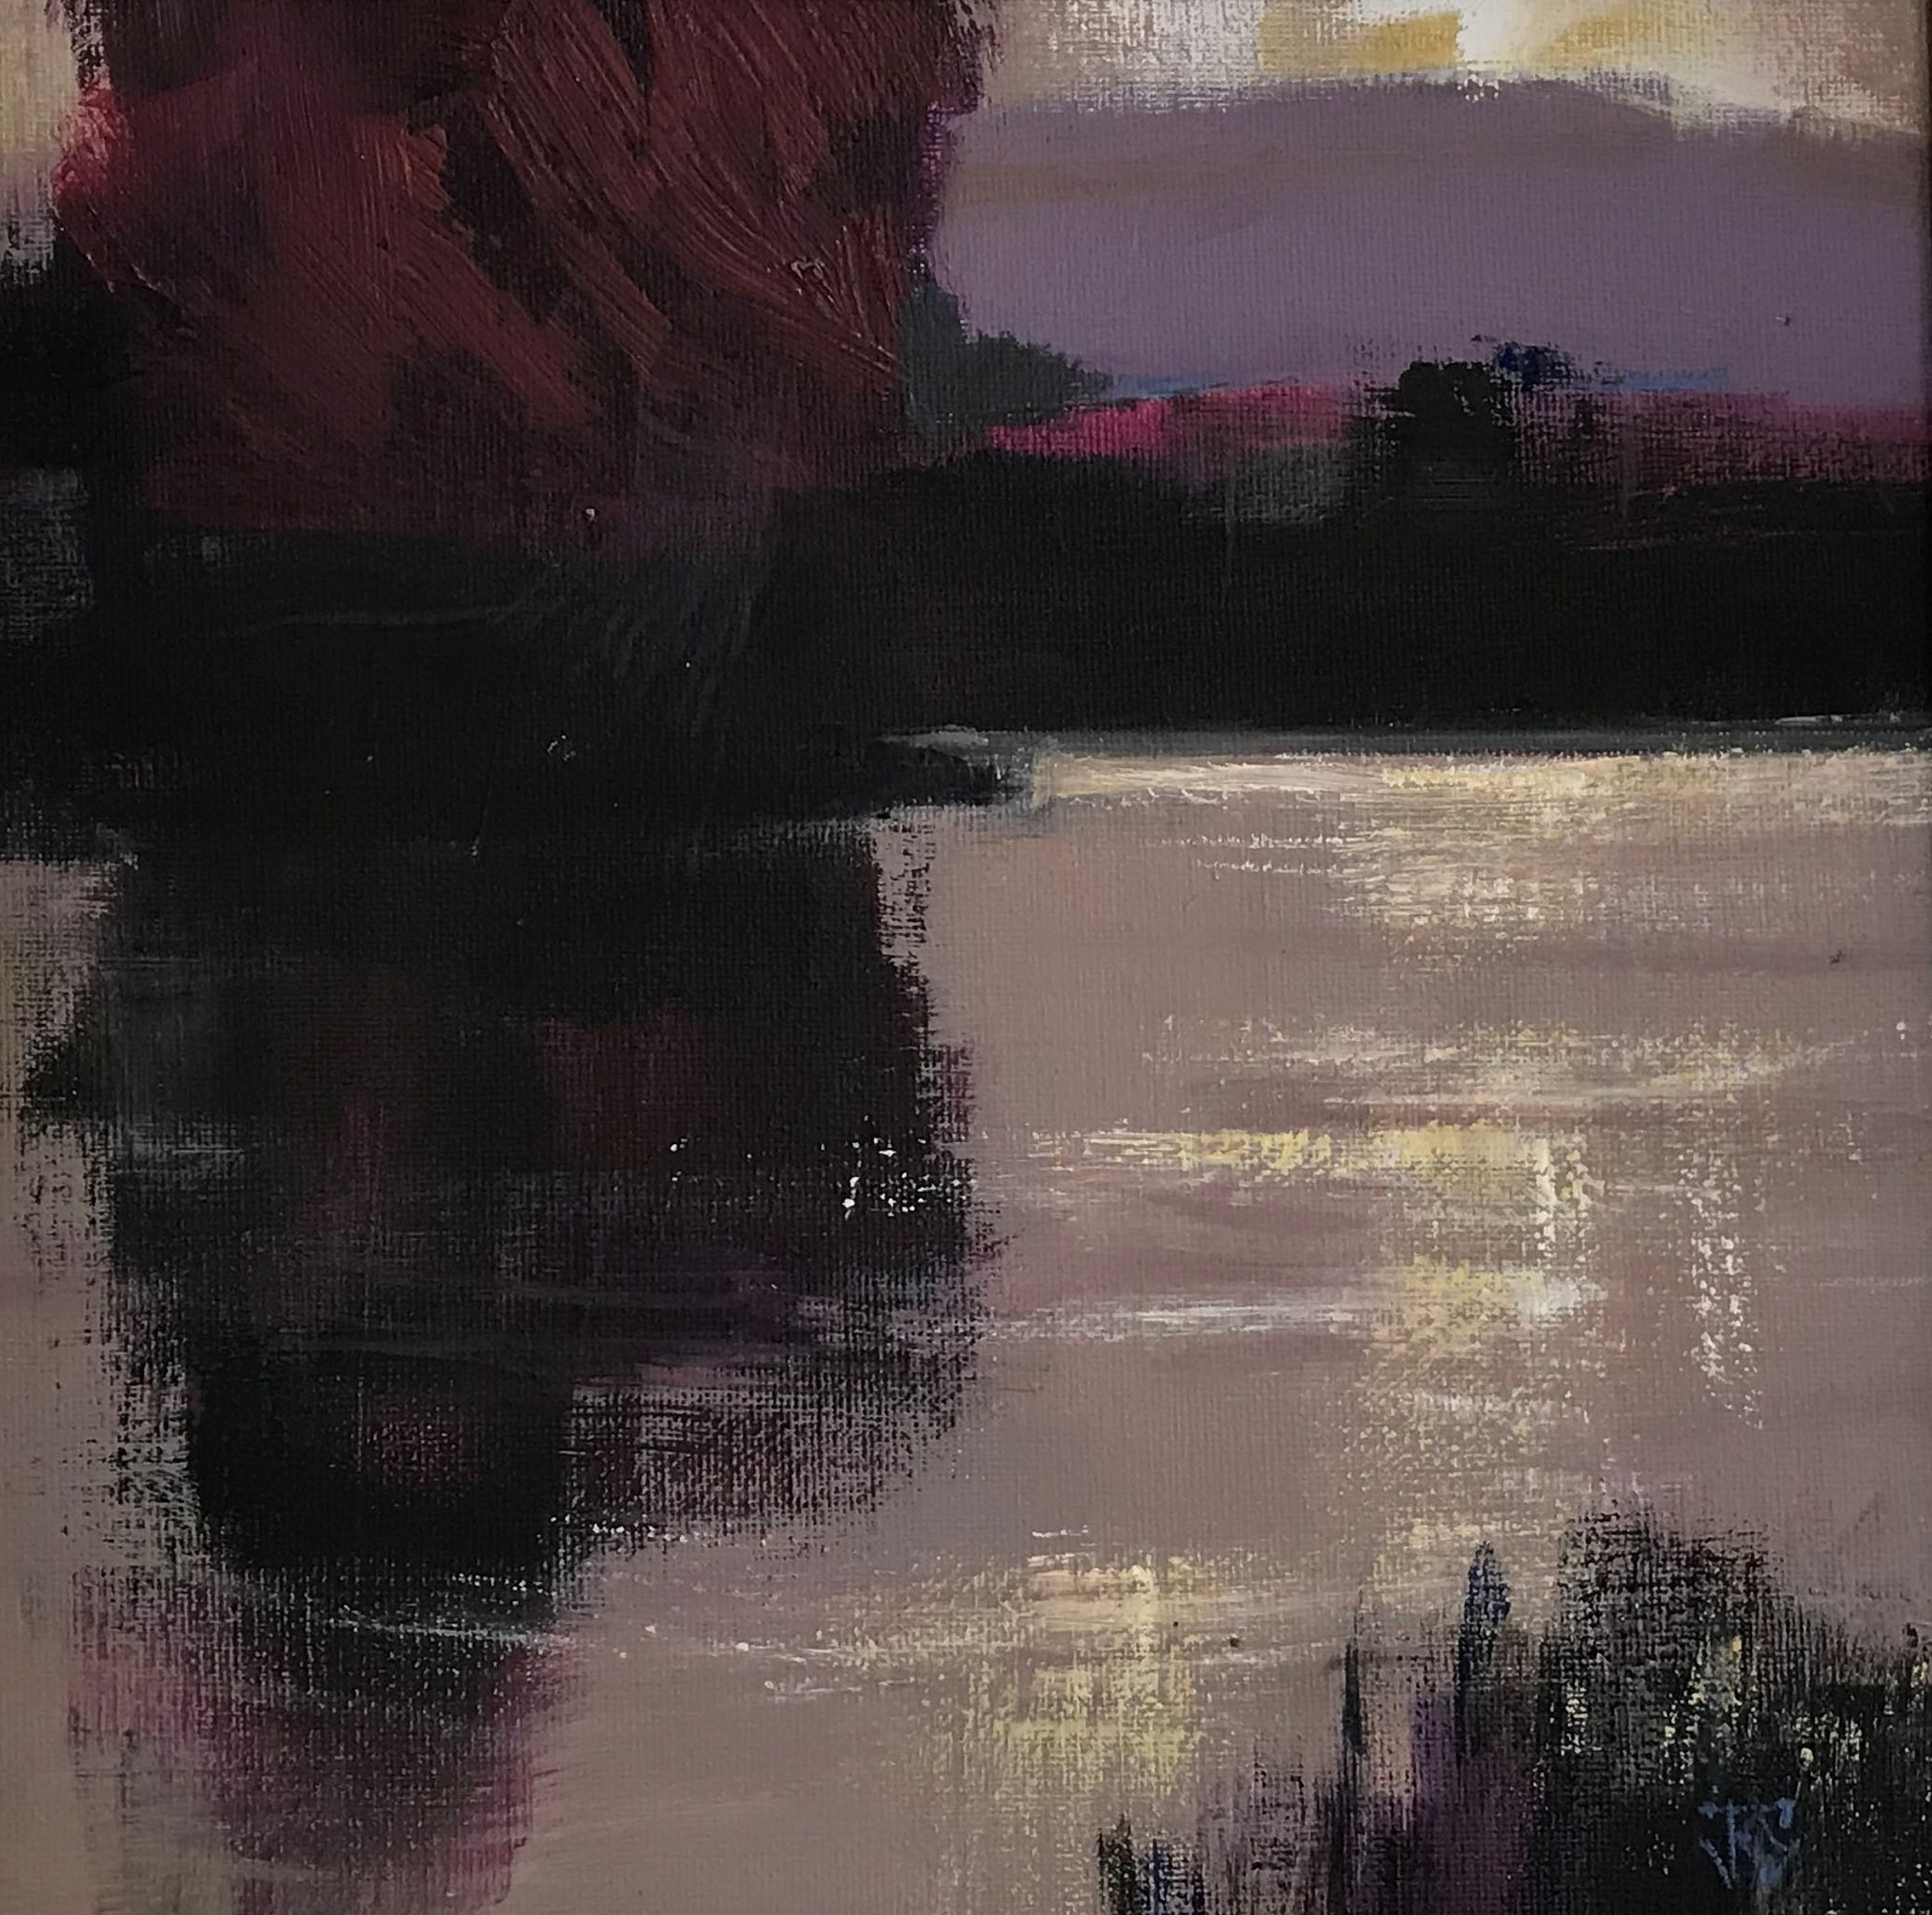 River Tay 16